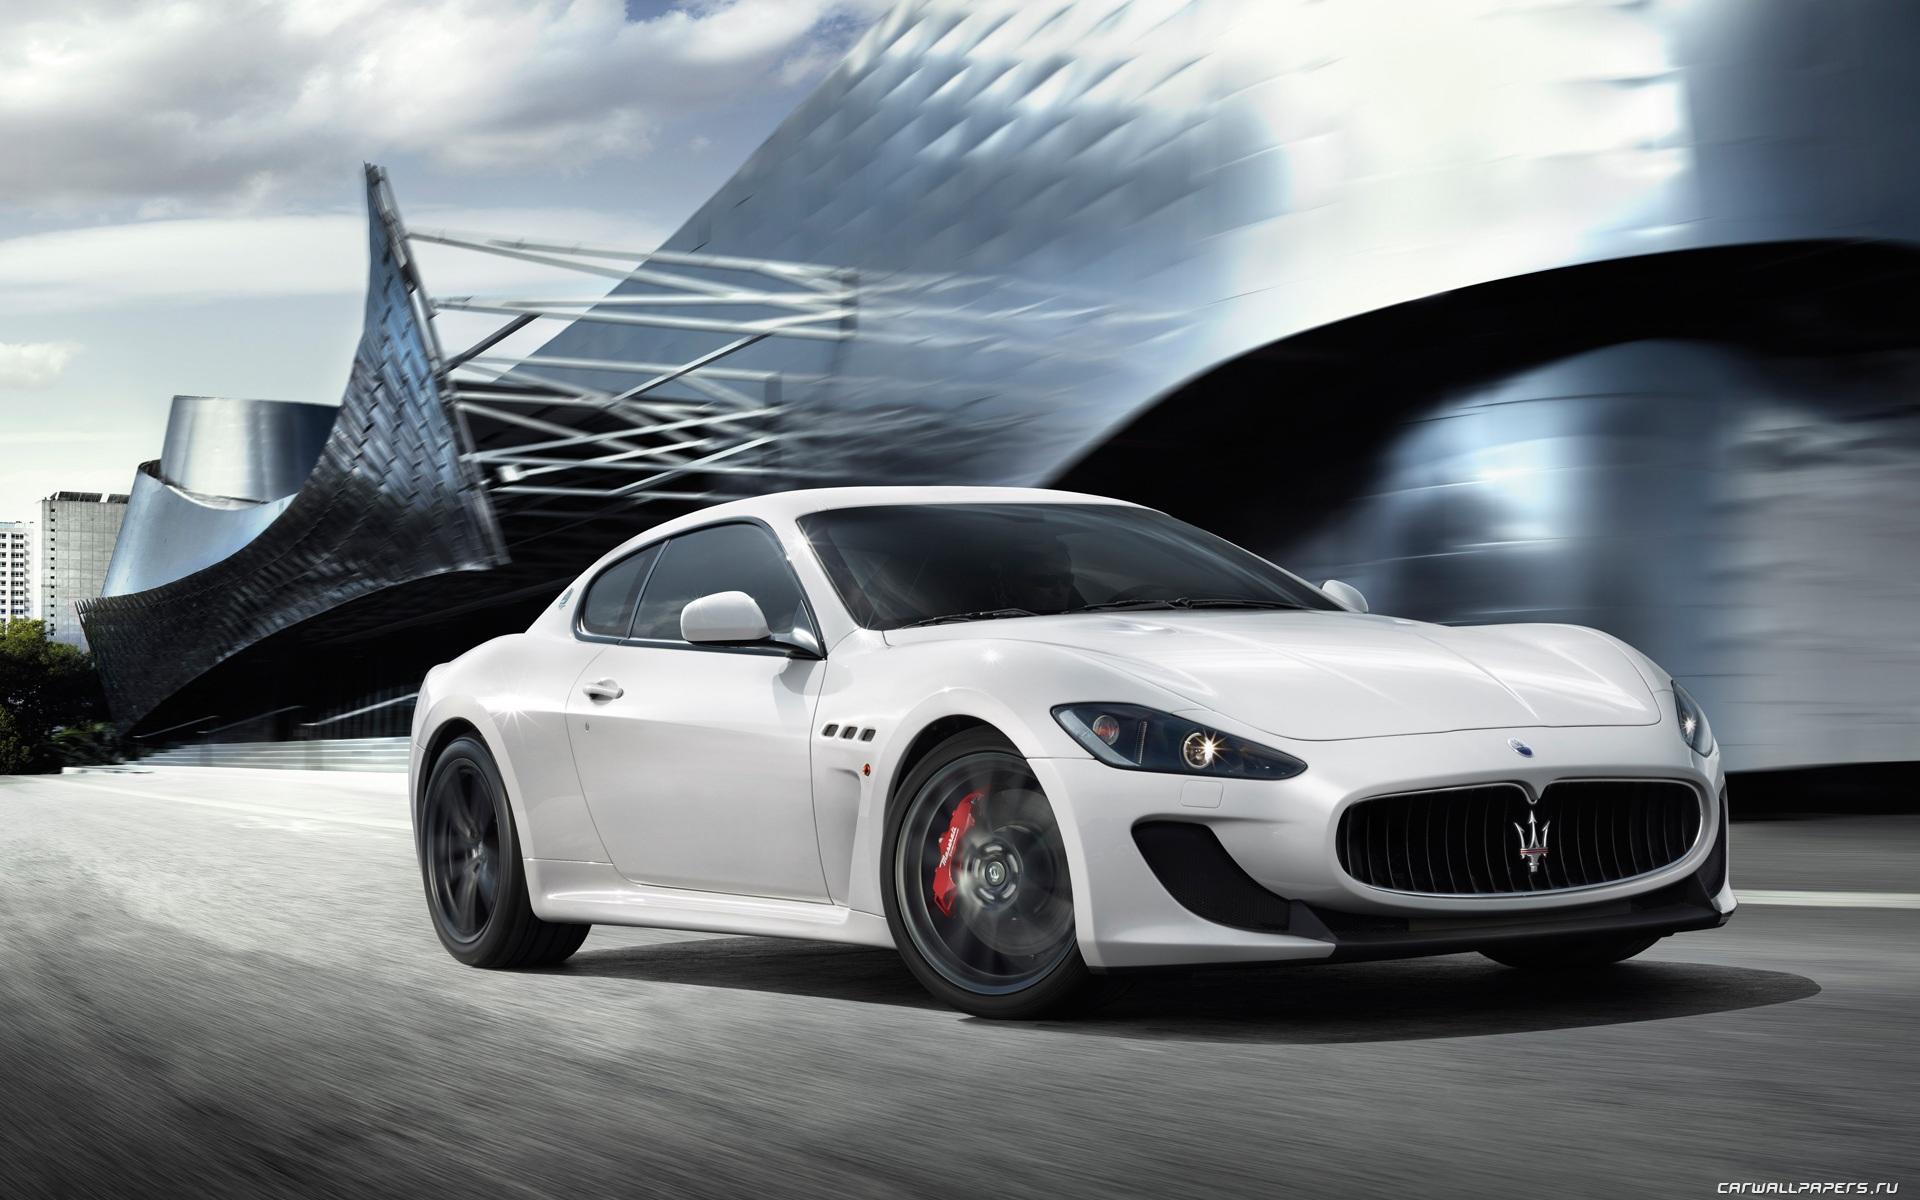 Maserati GranTurismo MC Stradale 2010 Обои | 1920x1200 ...